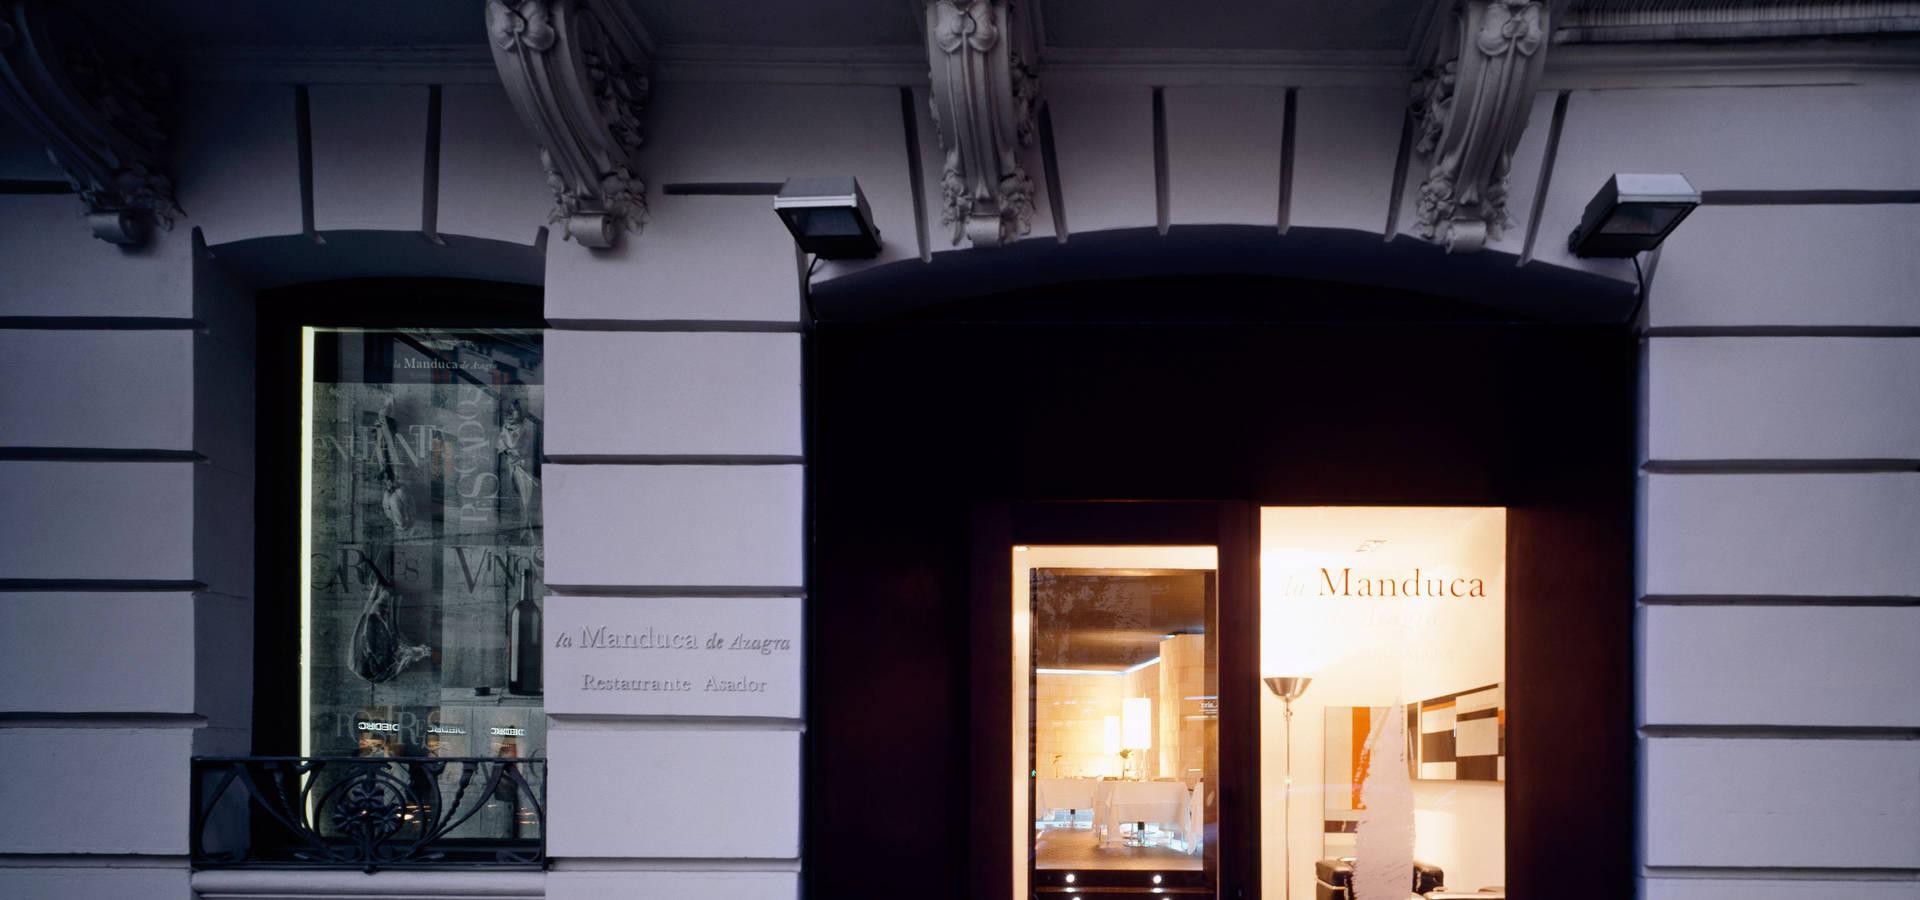 Francisco Mangado: Architecten in Pamplona | homify